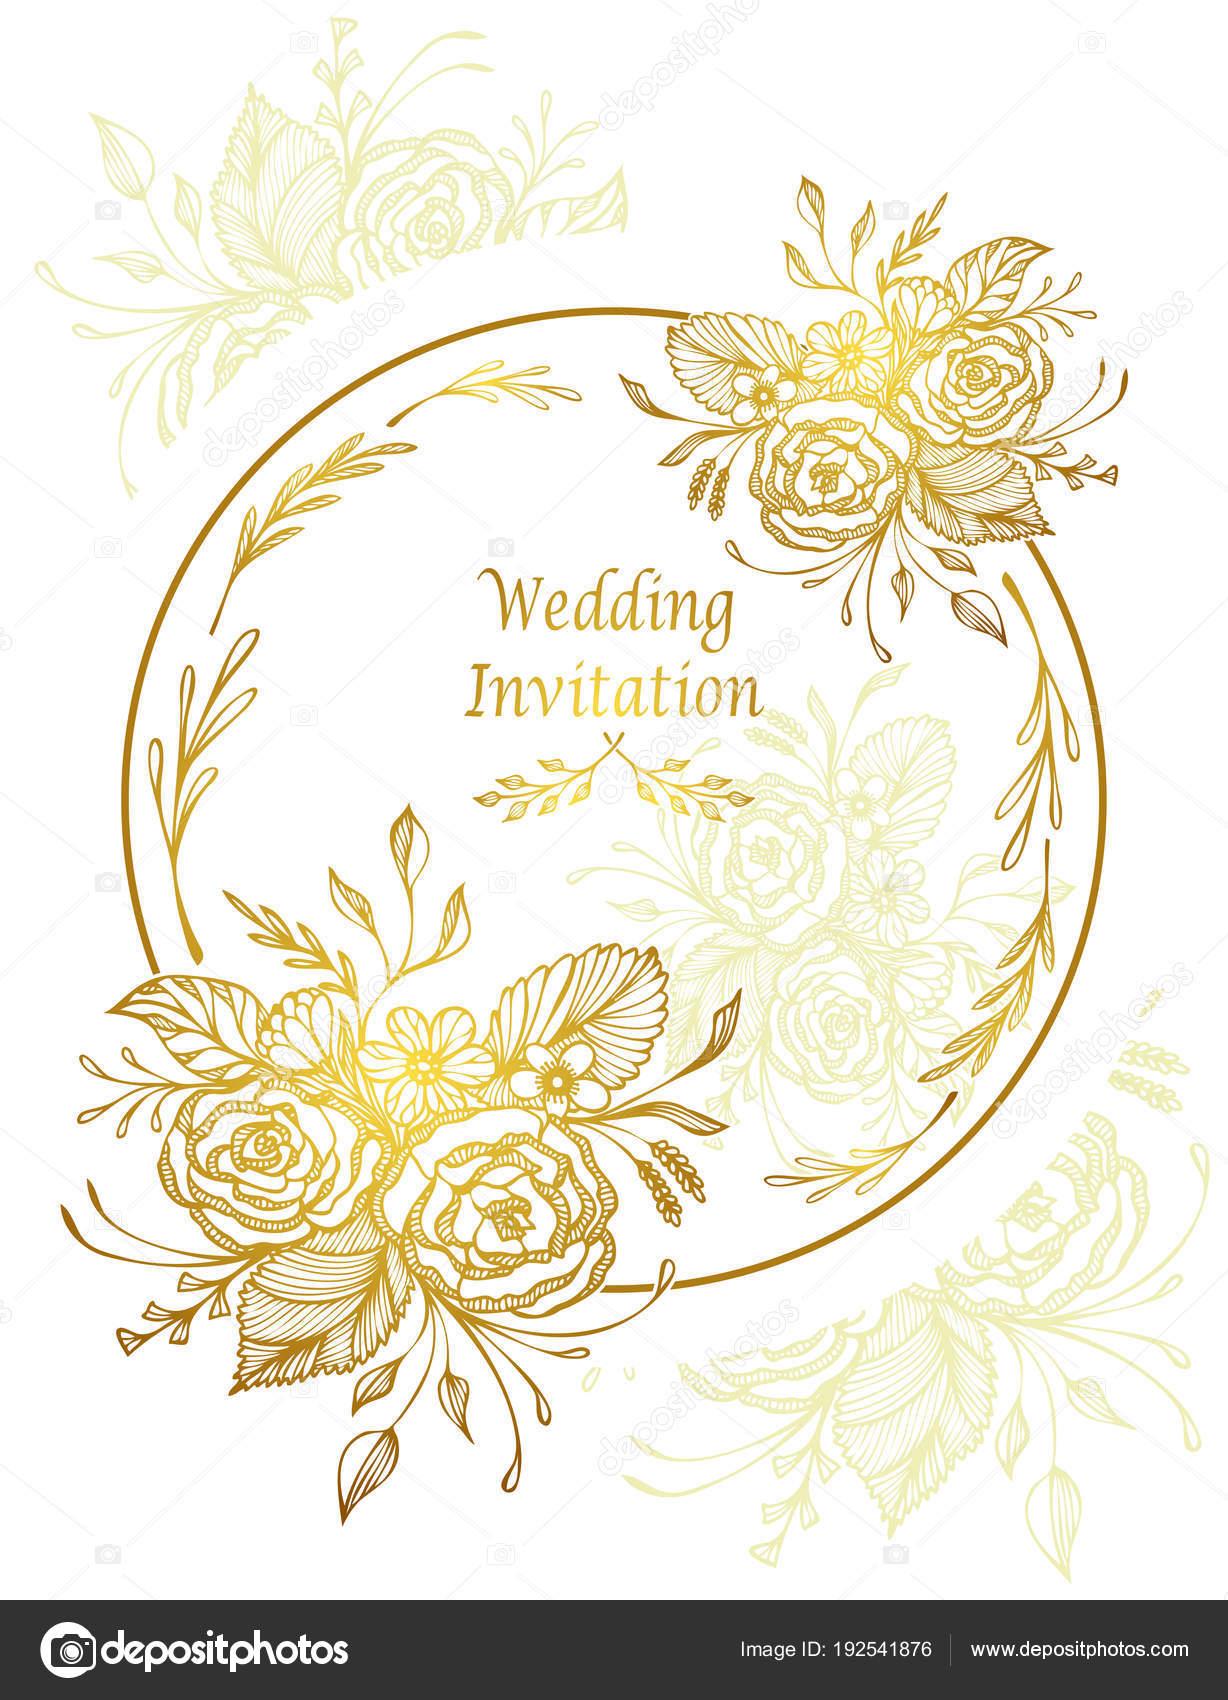 Elegant Wedding Invitation Card Template Hand Drawn Flowers Bouquet